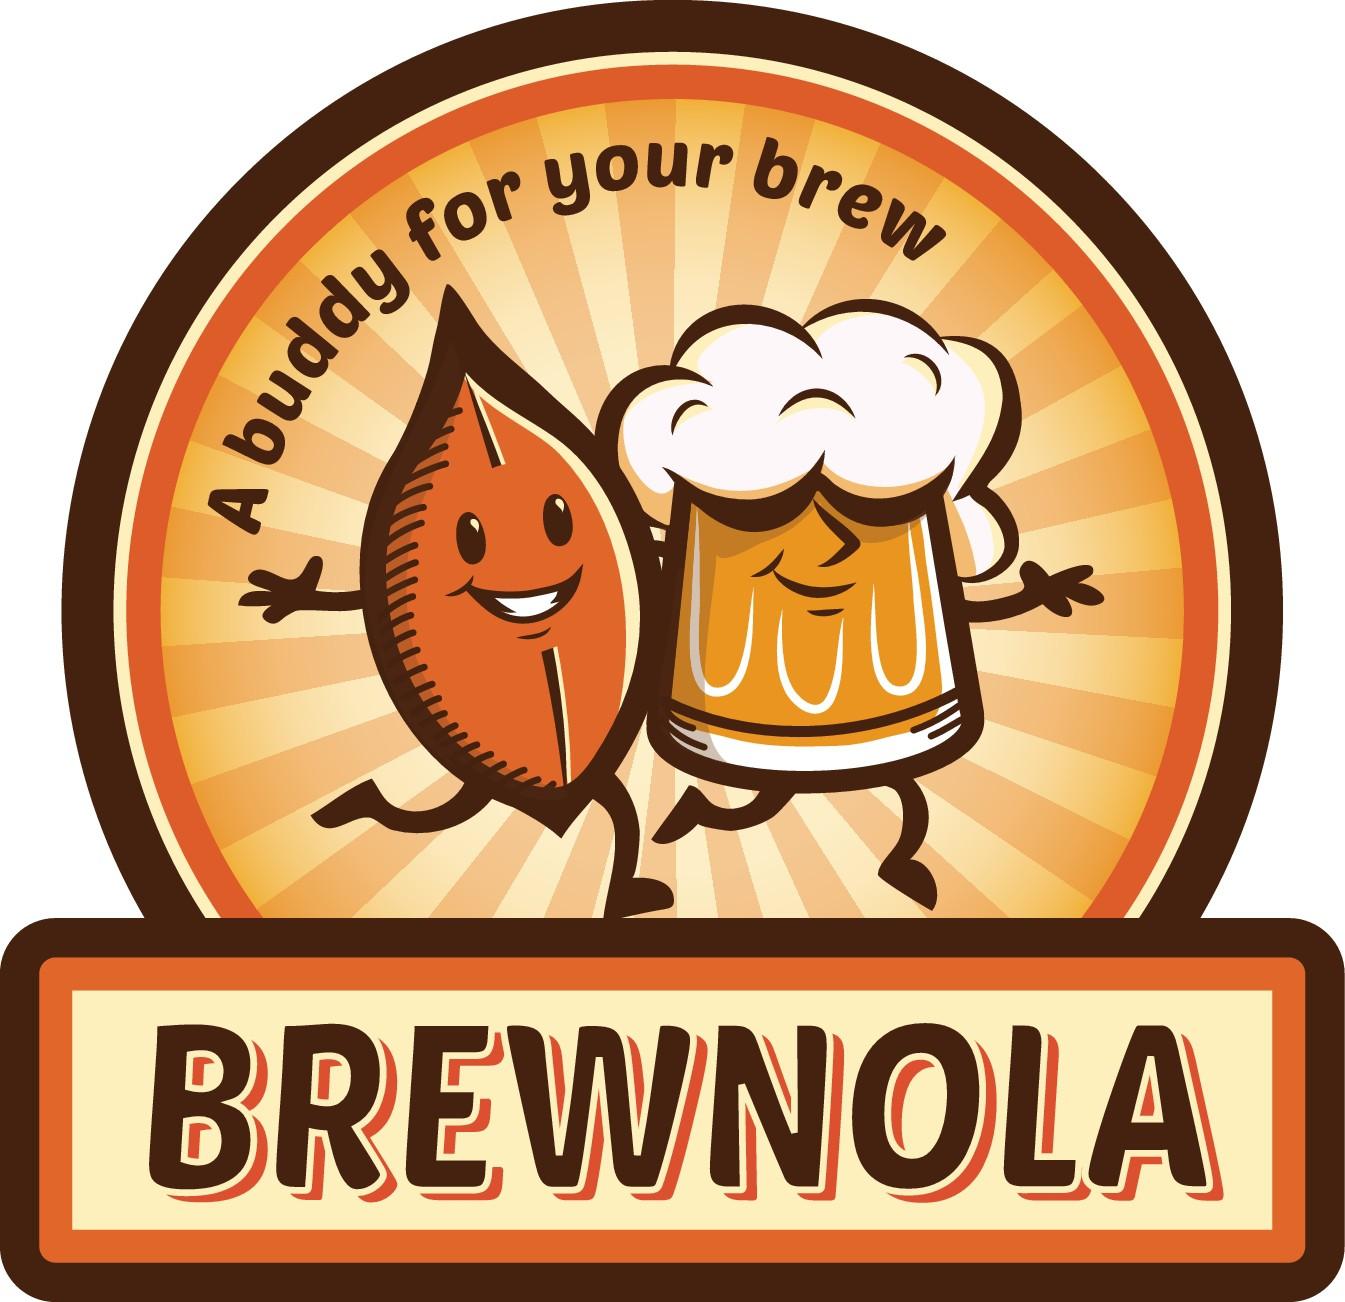 Create a fun, friendly logo to get people snacking on Brewnola!